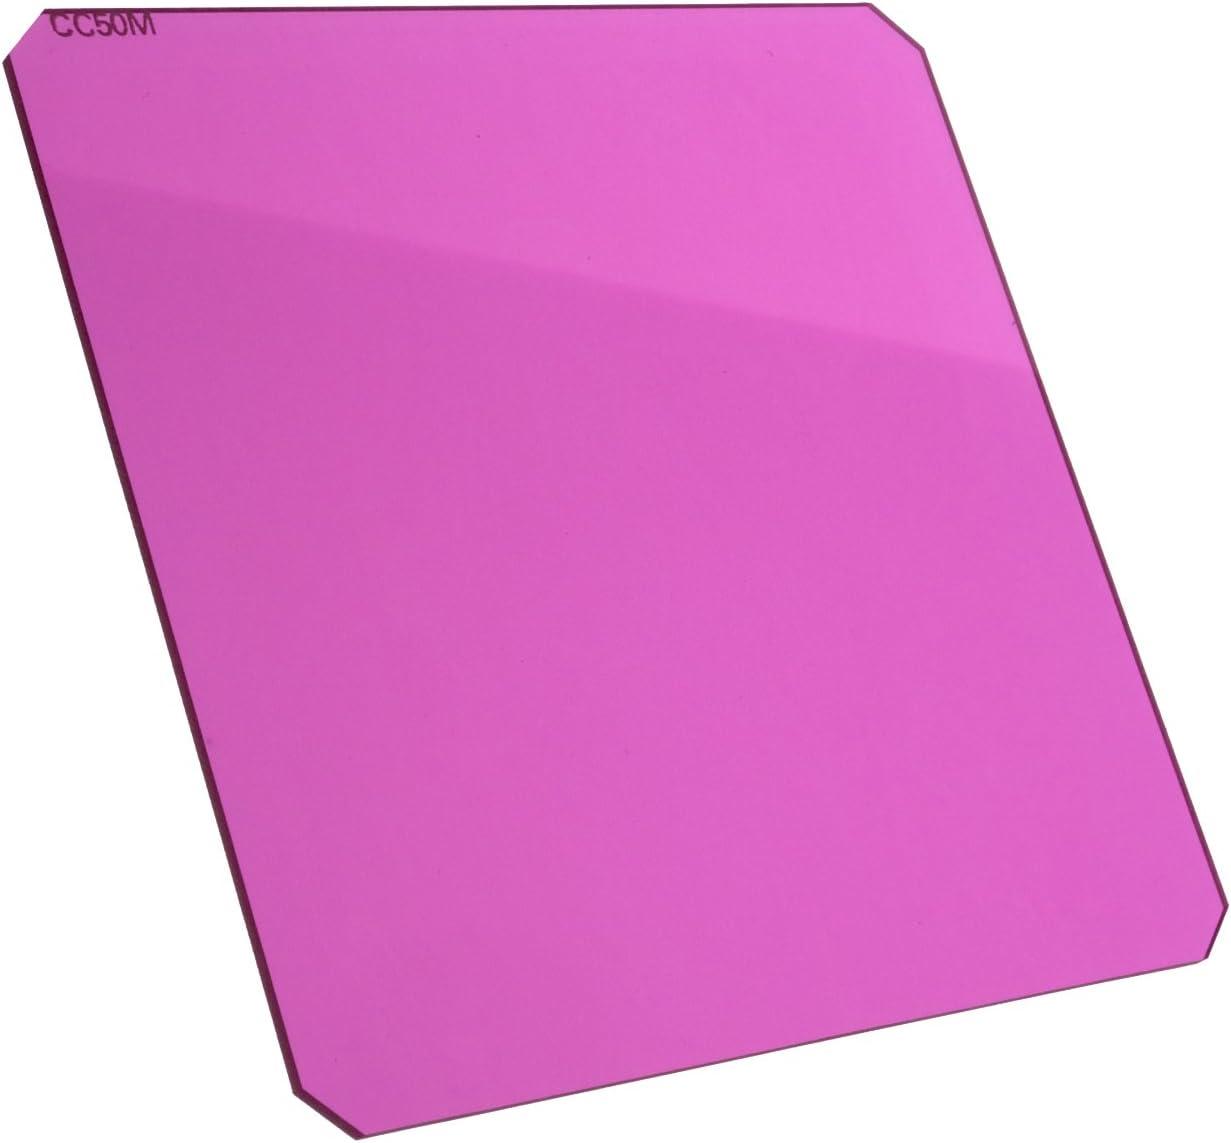 2.67x3.35 Formatt-Hitech 67x85mm Resin Color Correction Magenta 20